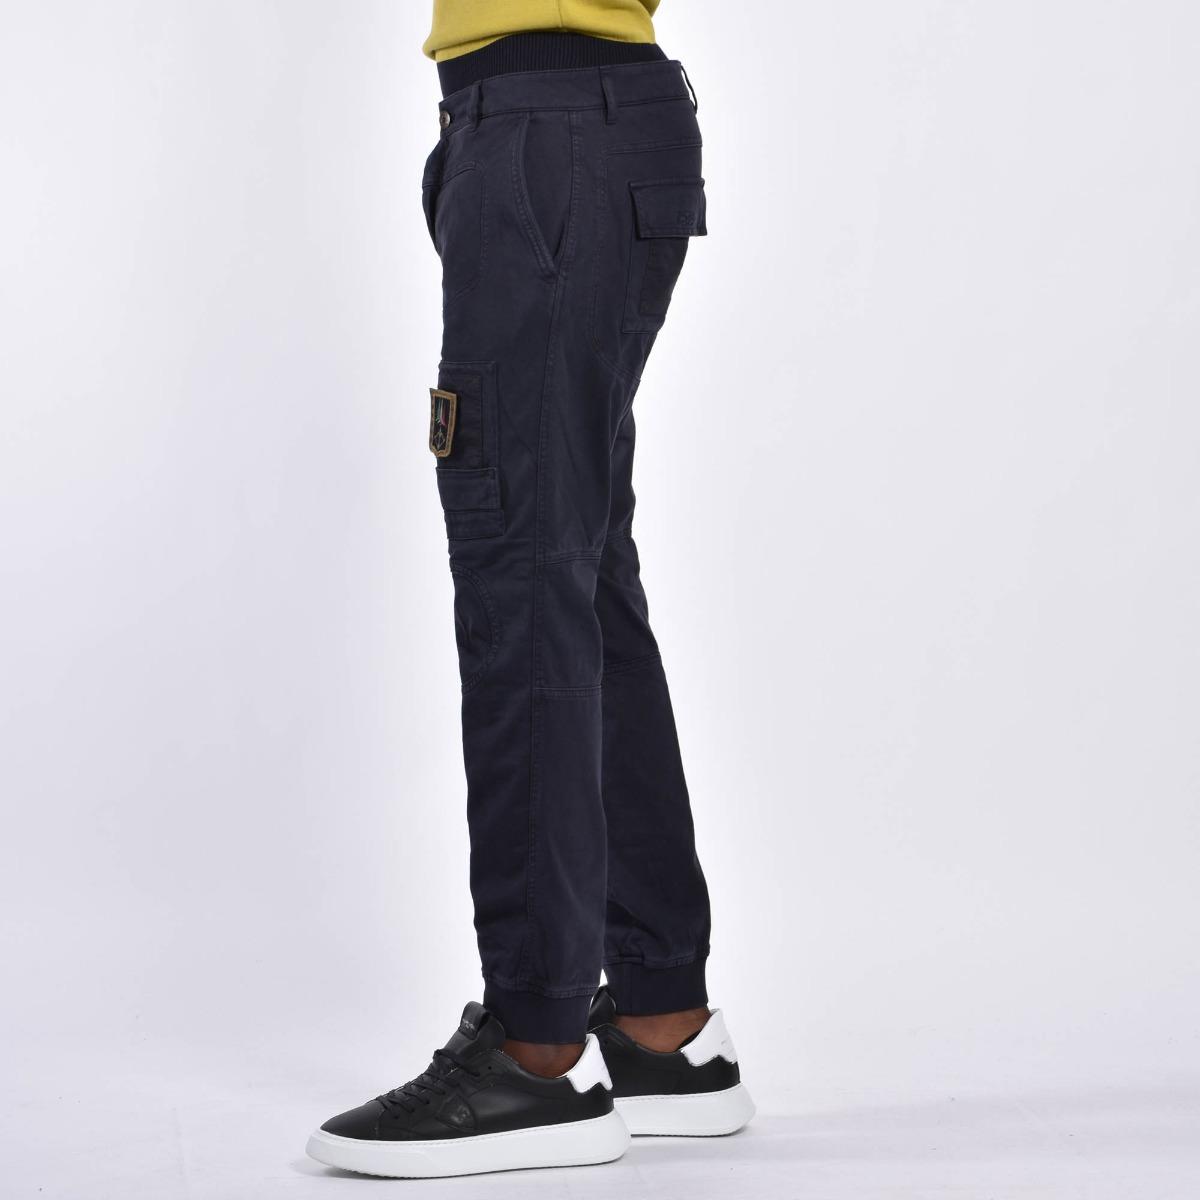 Pantalone anti-g - Blu black